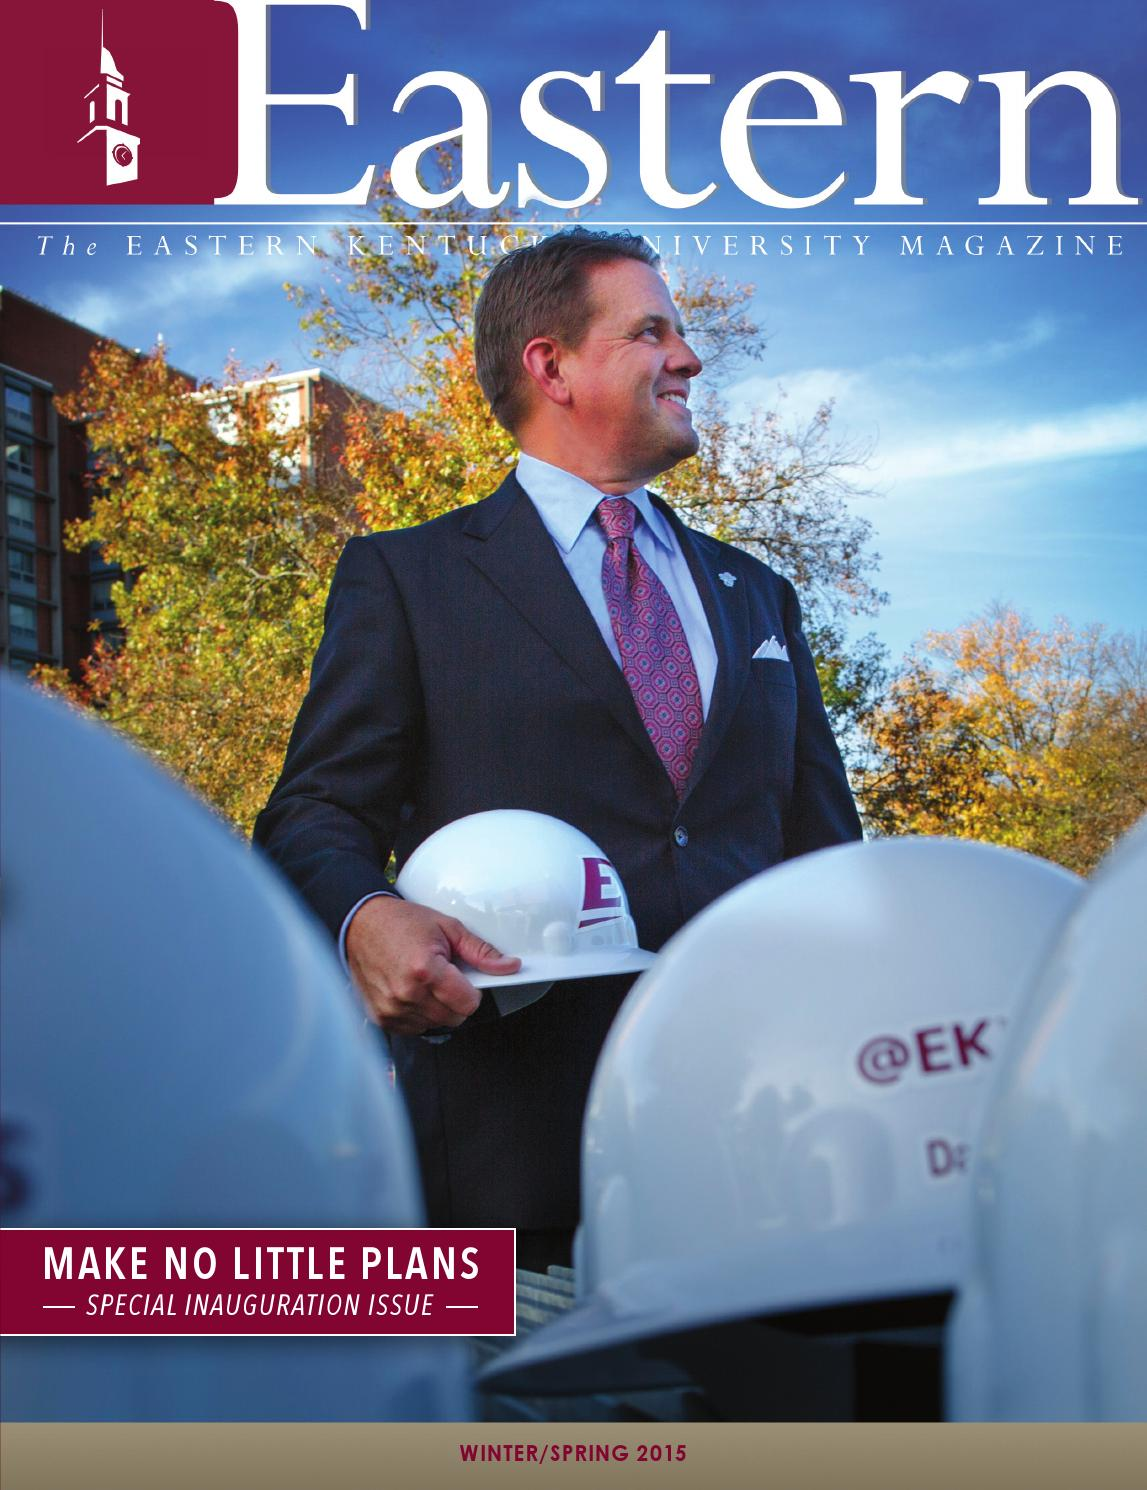 Eastern Kentucky University Magazine, Winter/Spring 2015